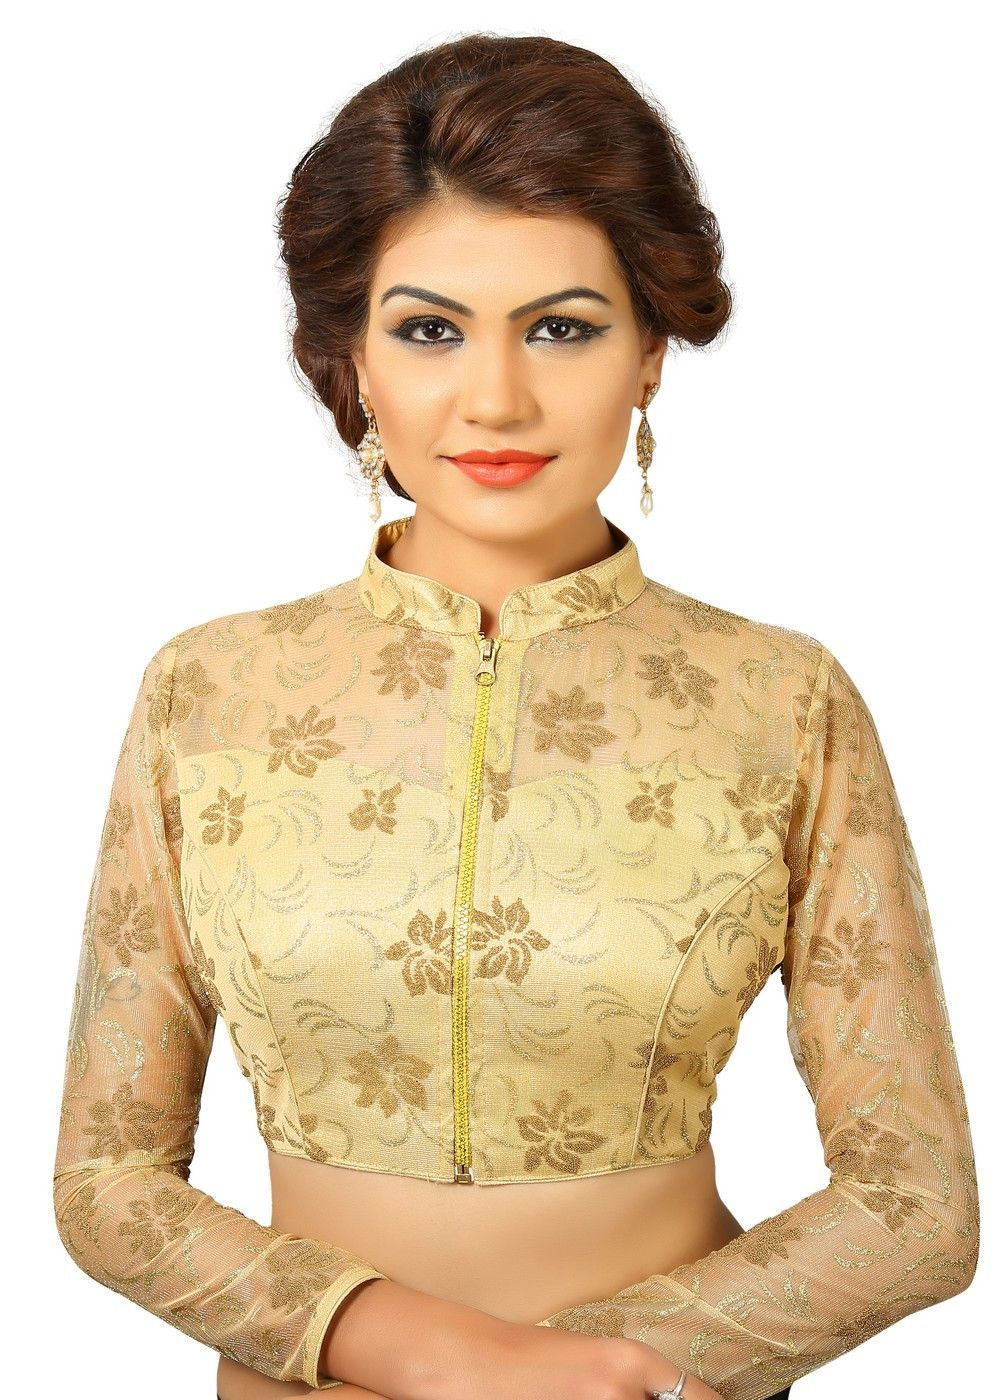 Front zip blouse designs – Designer blouses with front zip